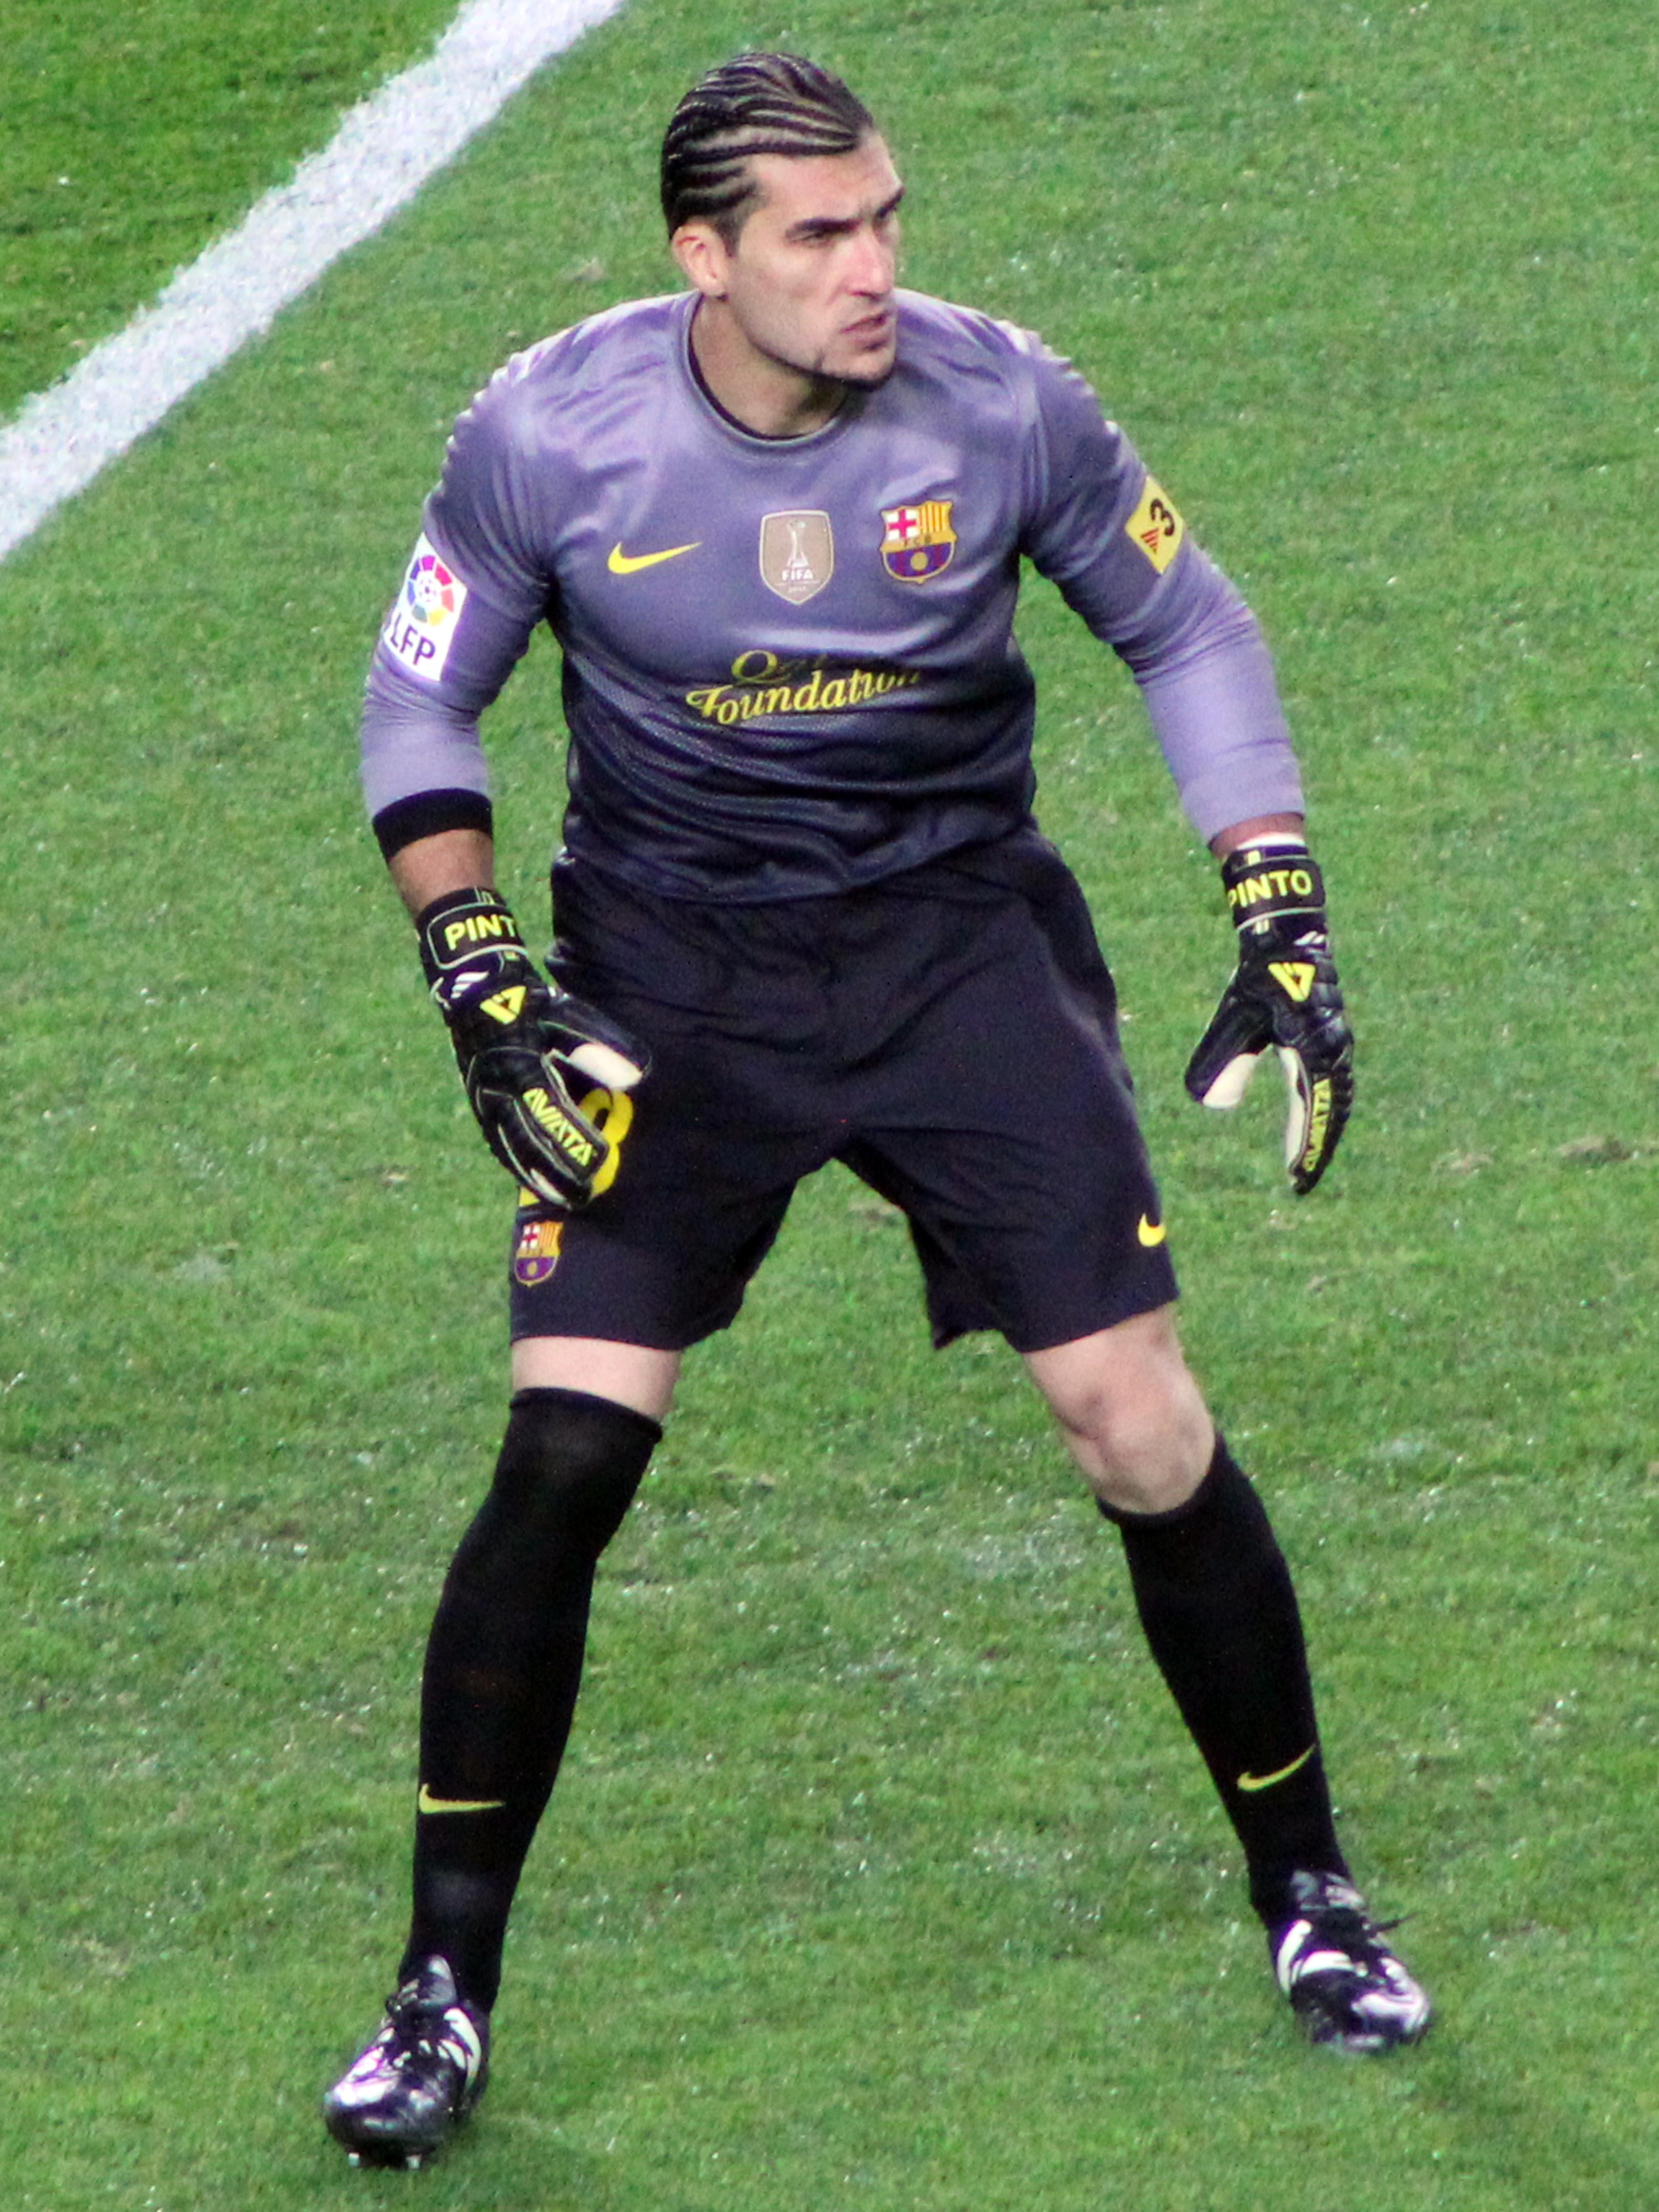 José Manuel Pinto - Wikipedia